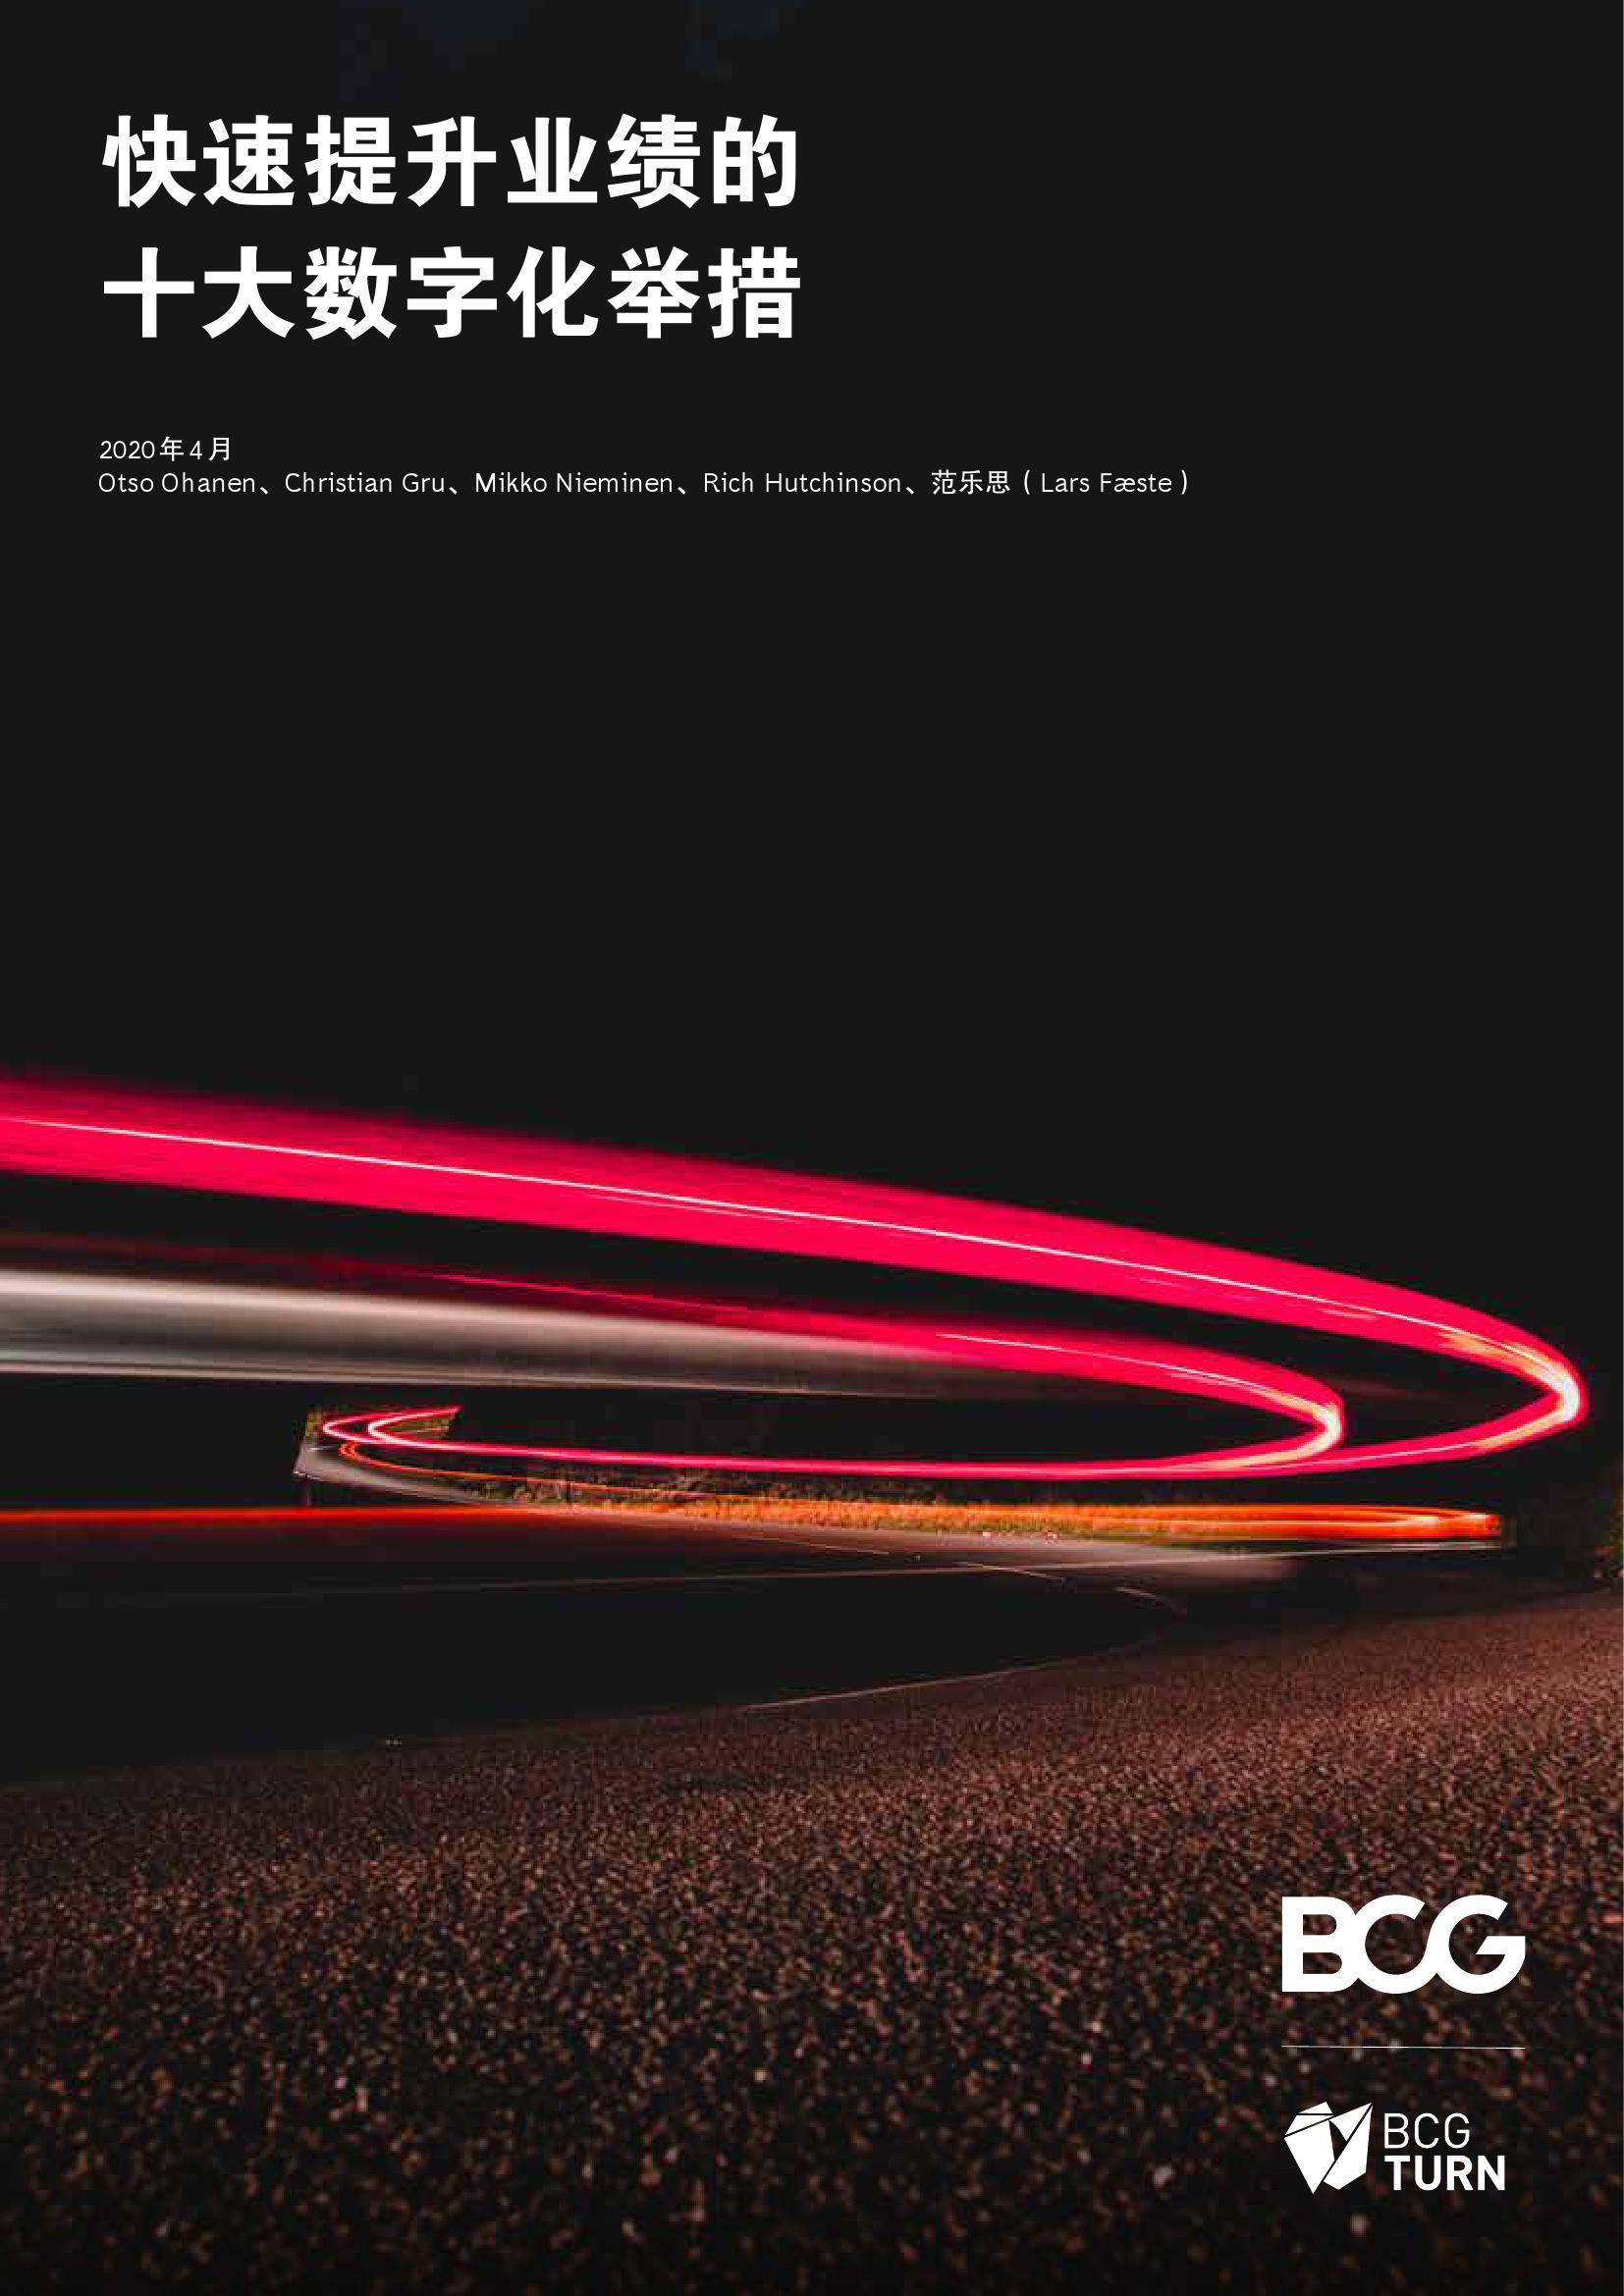 BCG:快速提升业绩的十大数字化举措(附下载)